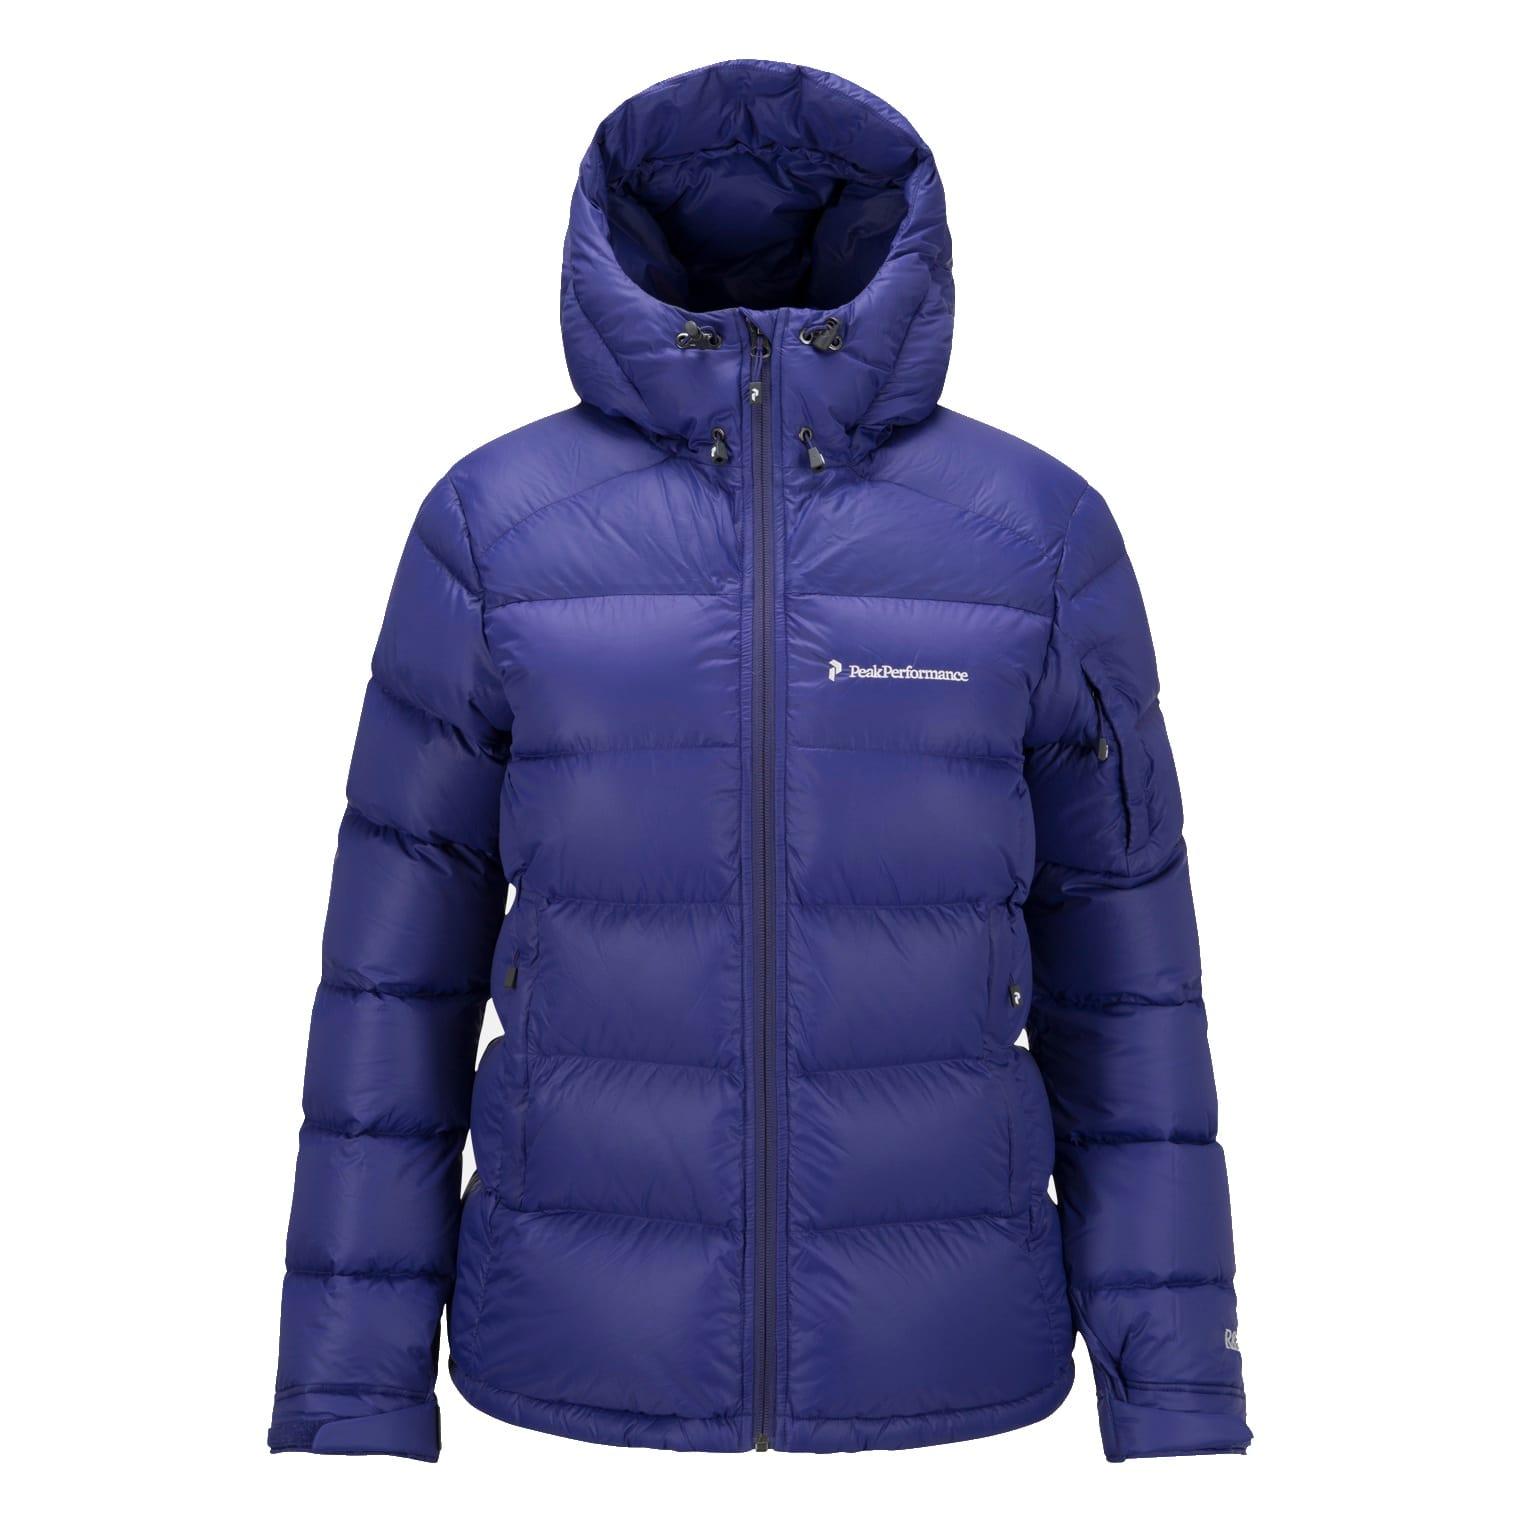 mode nya stilar fabrikspris Kjøp Peak Performance Women's Frost Down Jacket fra Outnorth